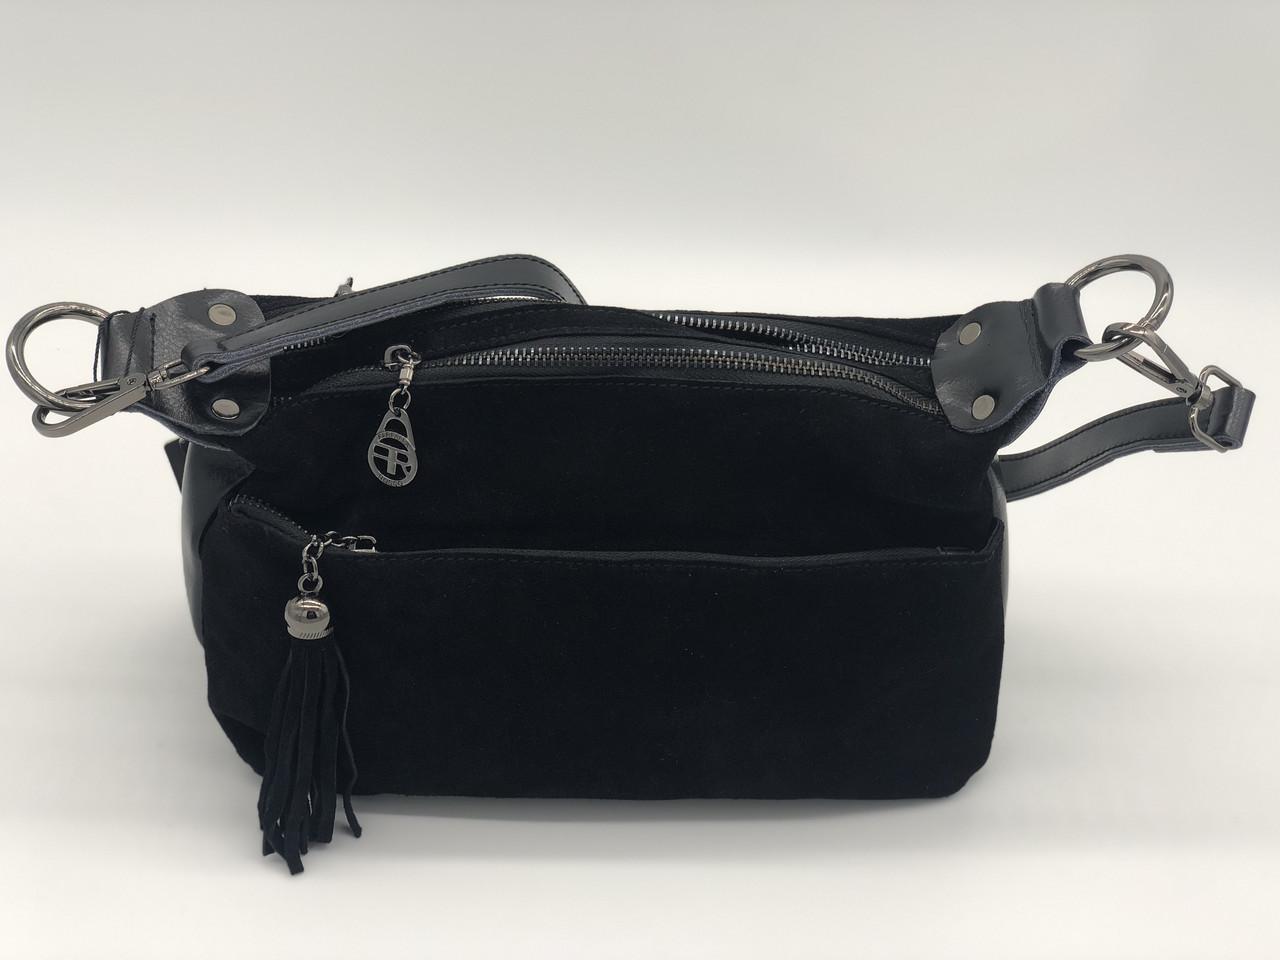 1bbd9a4b1747 ... Женские сумочки и клатчи; Замшевая сумка Farfalla Rosso. Замшевая сумка  Farfalla Rosso